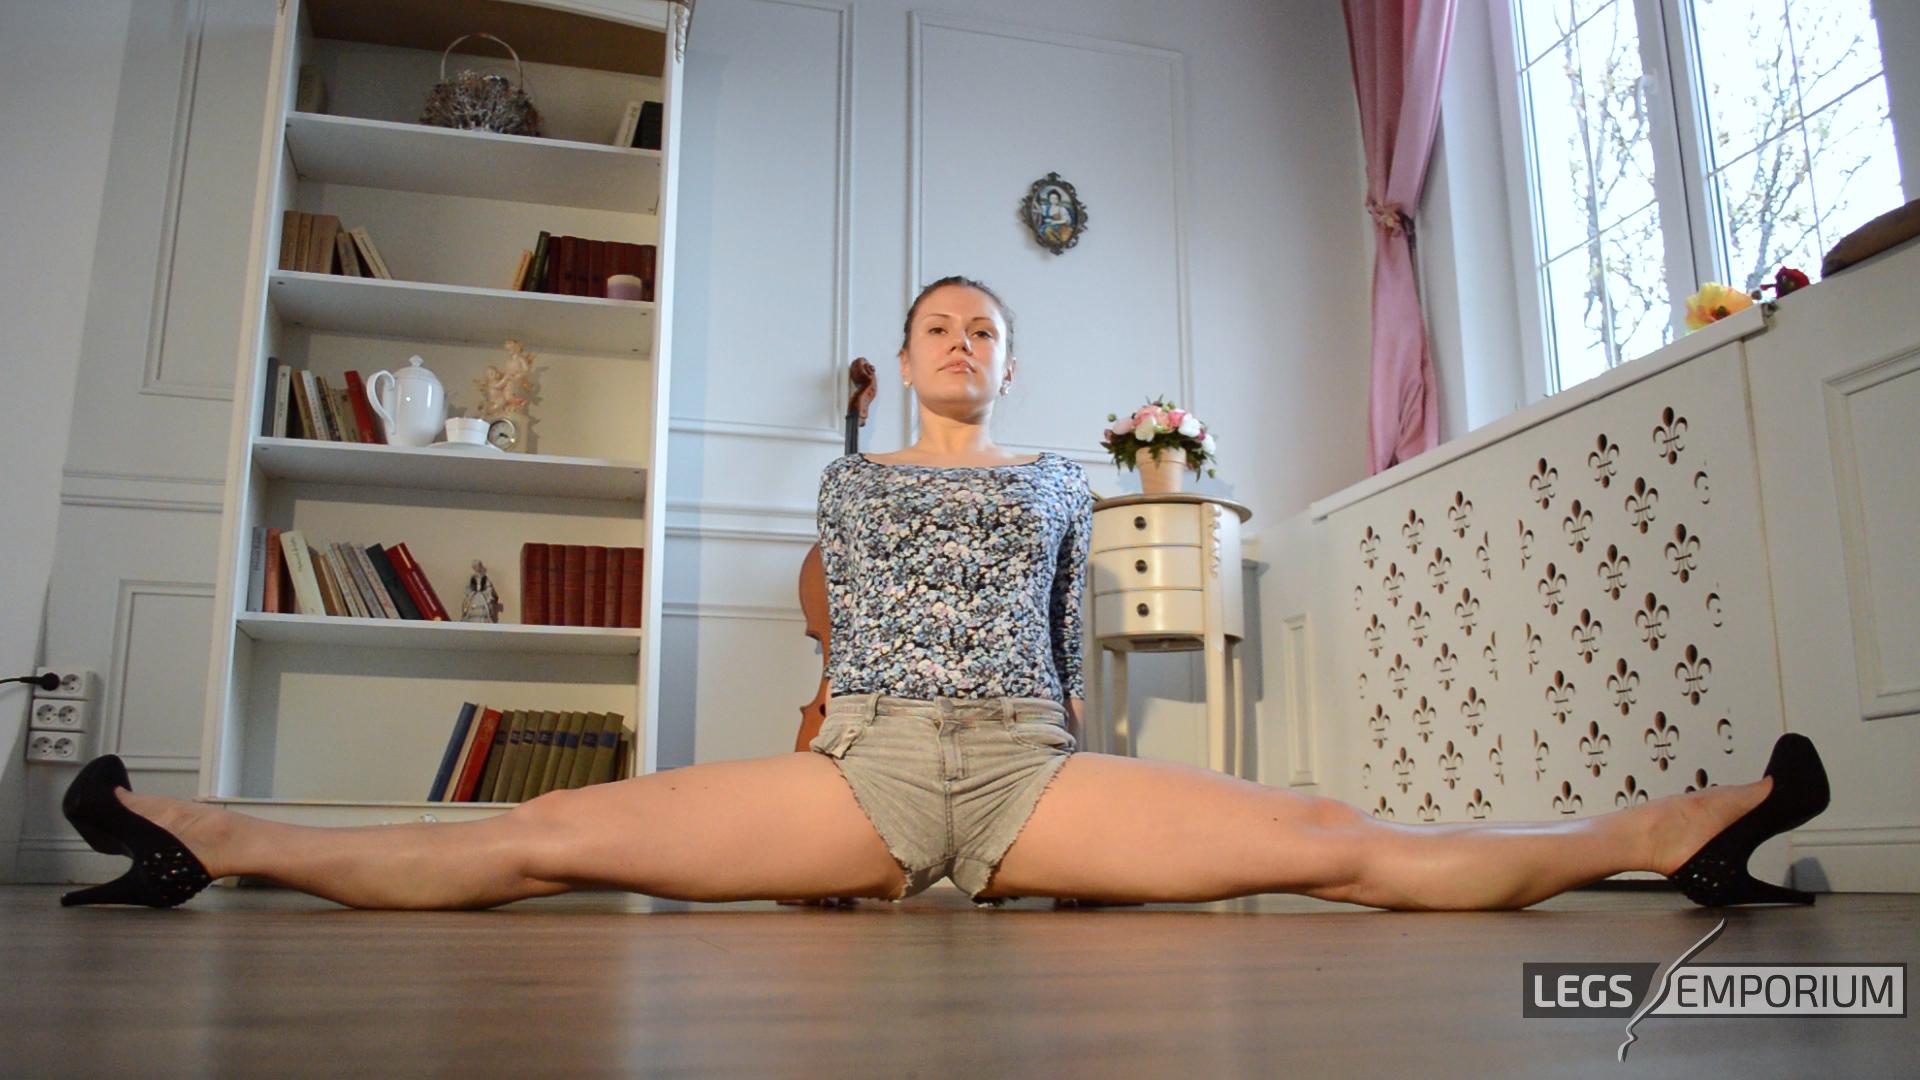 Y E Bendy Leggy Splits Bliss 1 Legs Emporium